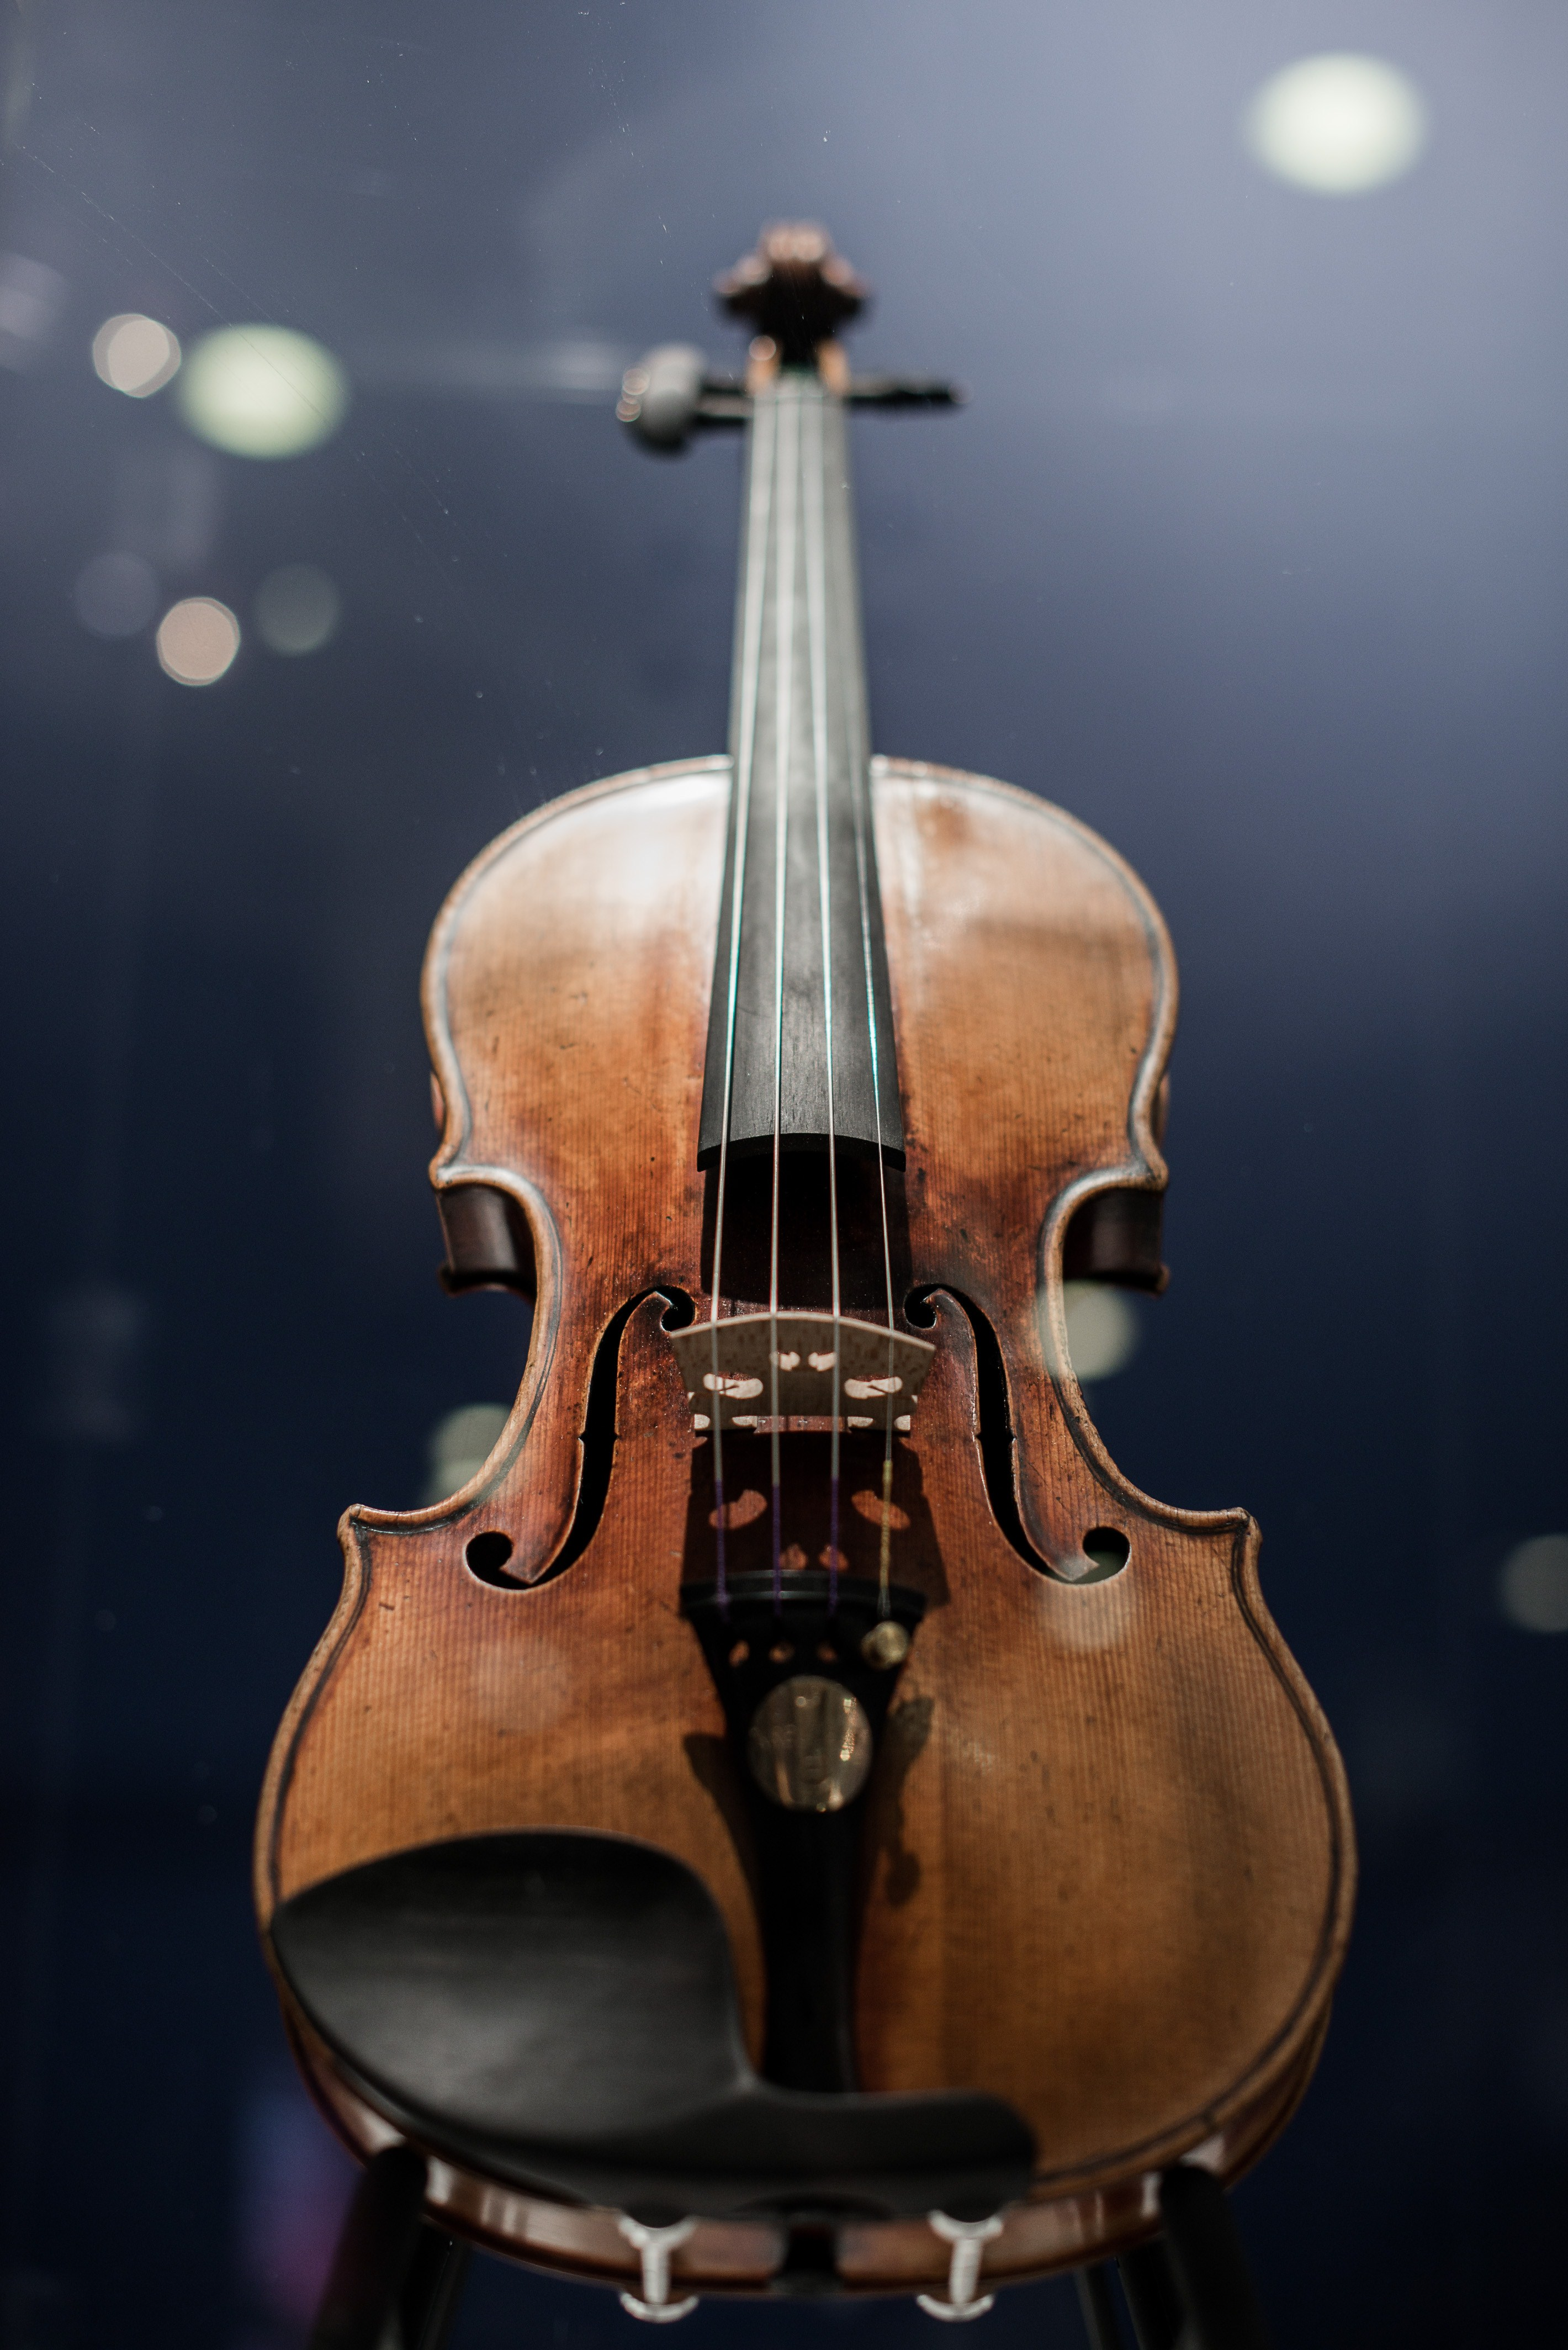 Kreutzer Stradivarius violin